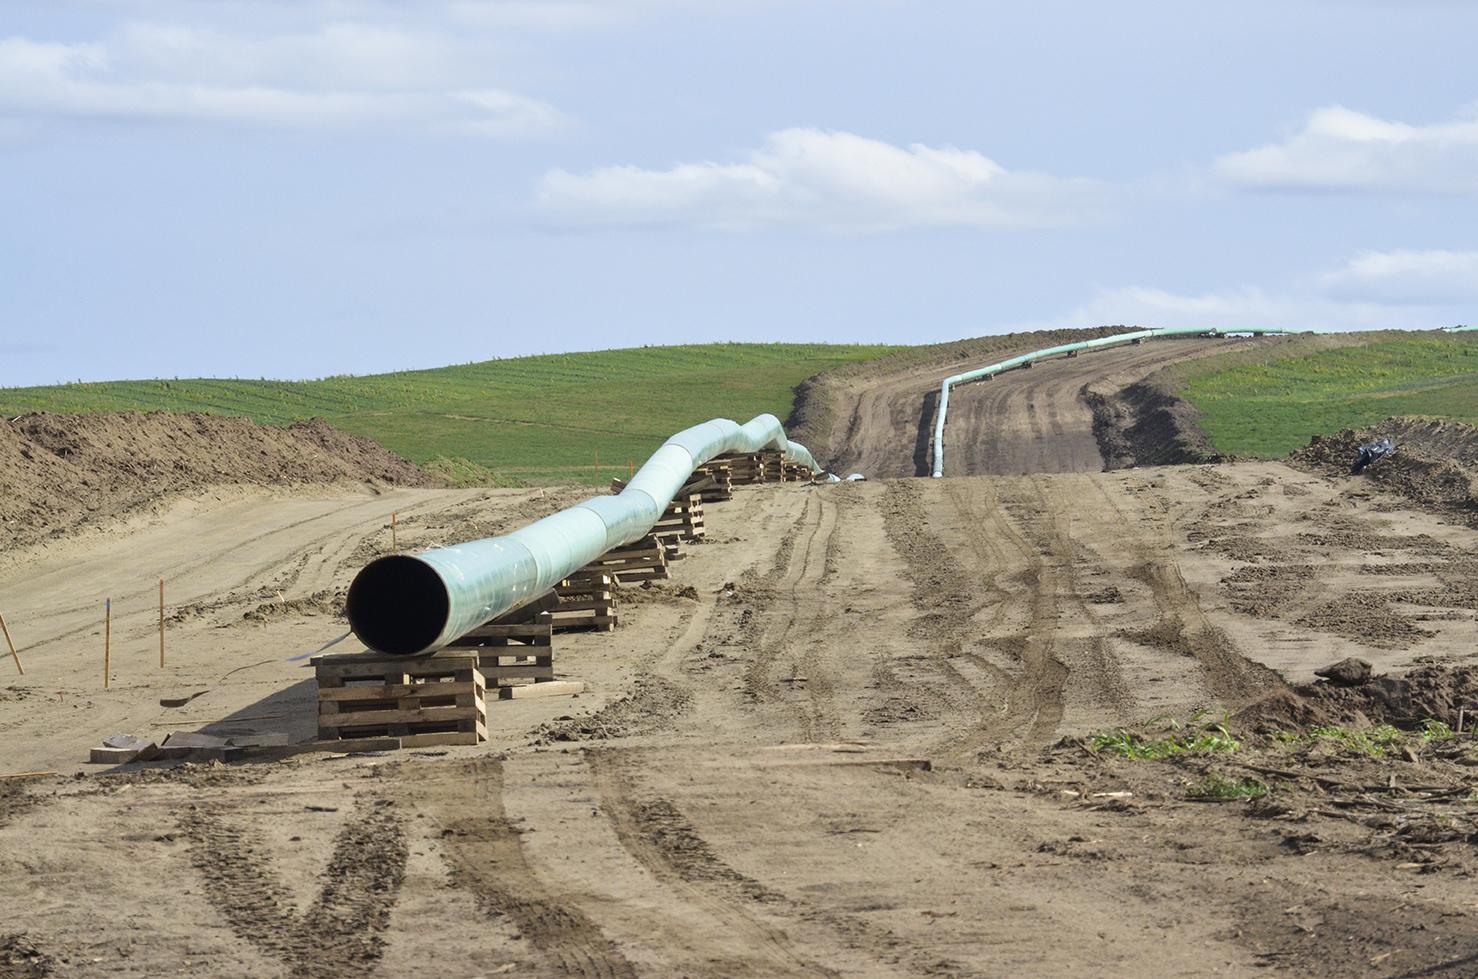 DAPL_Oct16_DAPL-Pipeline_ASisk_web.jpg